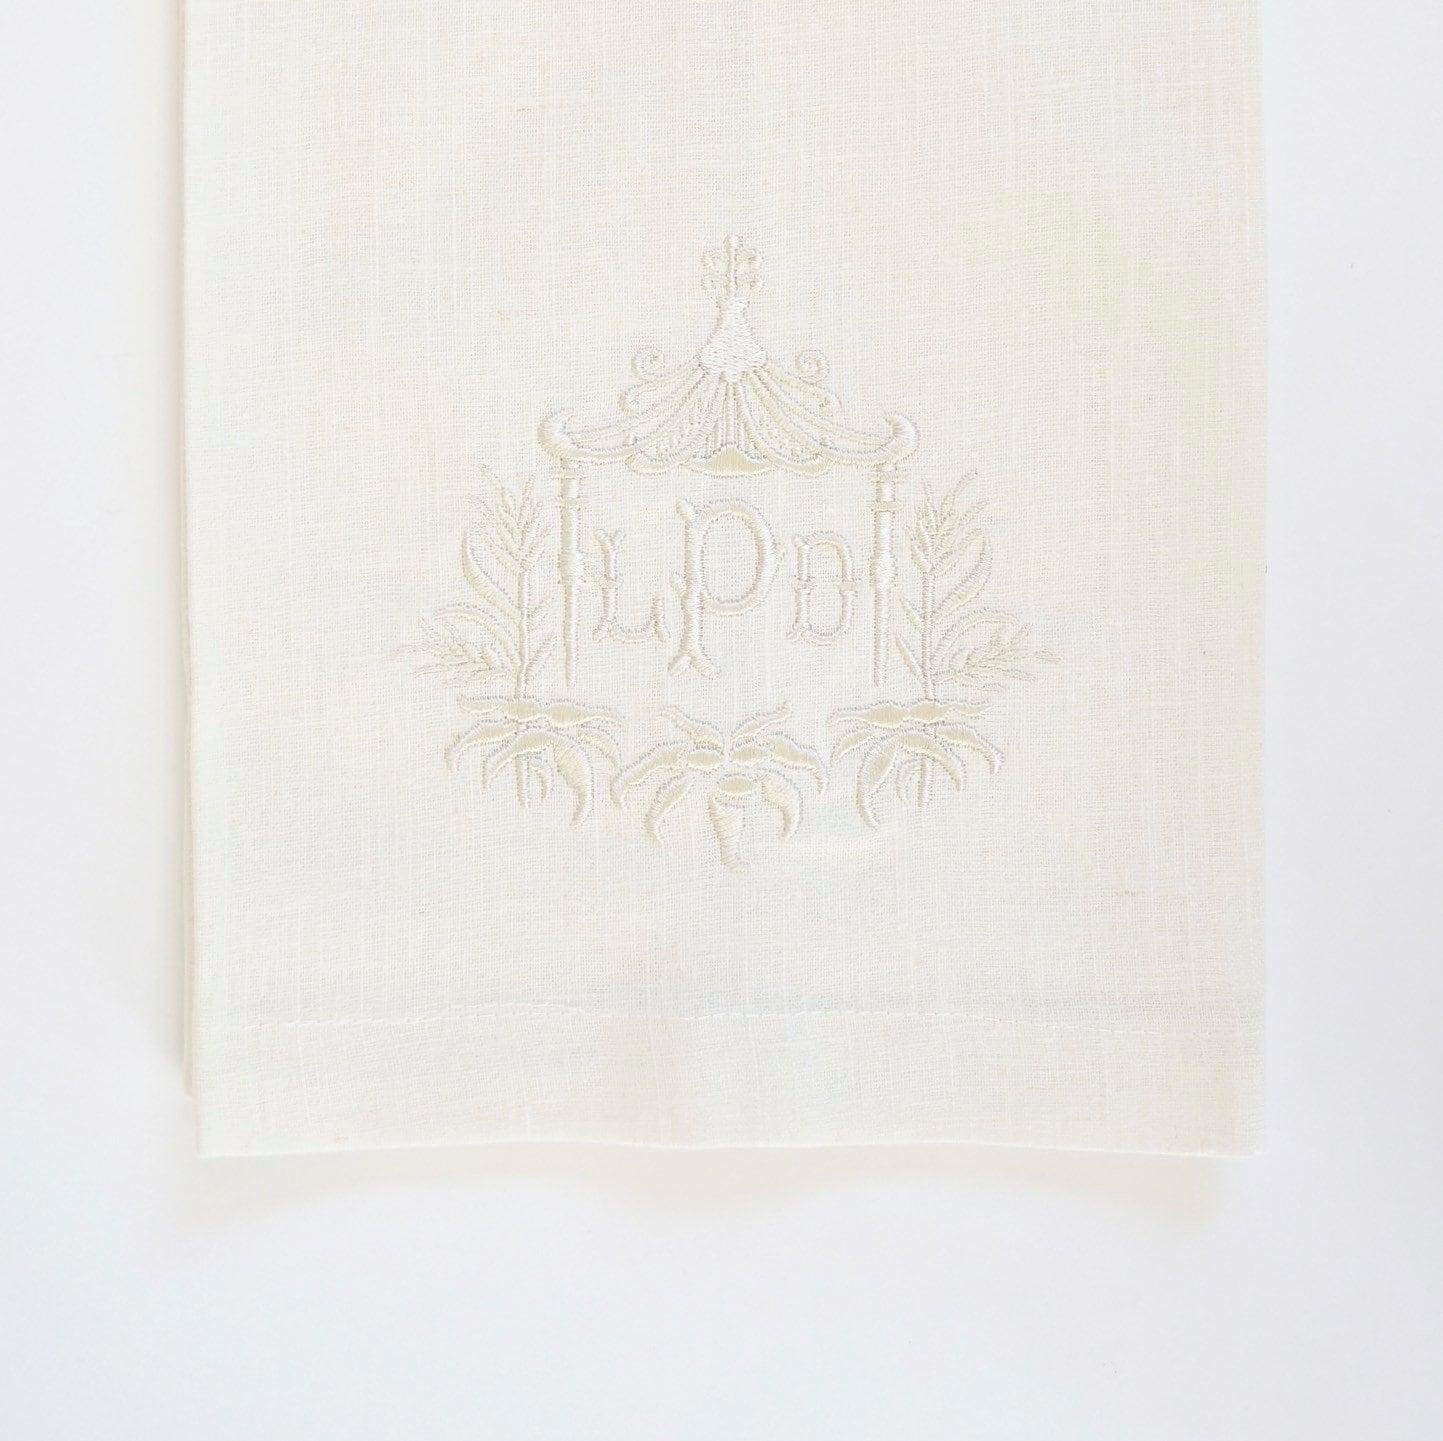 Pagoda Ii Monogram Custom Embroidered Cloth Napkins Linen Towels Wedding Or Hostess Gift Bridal Shower Gift Monogrammed Cotton Napkins